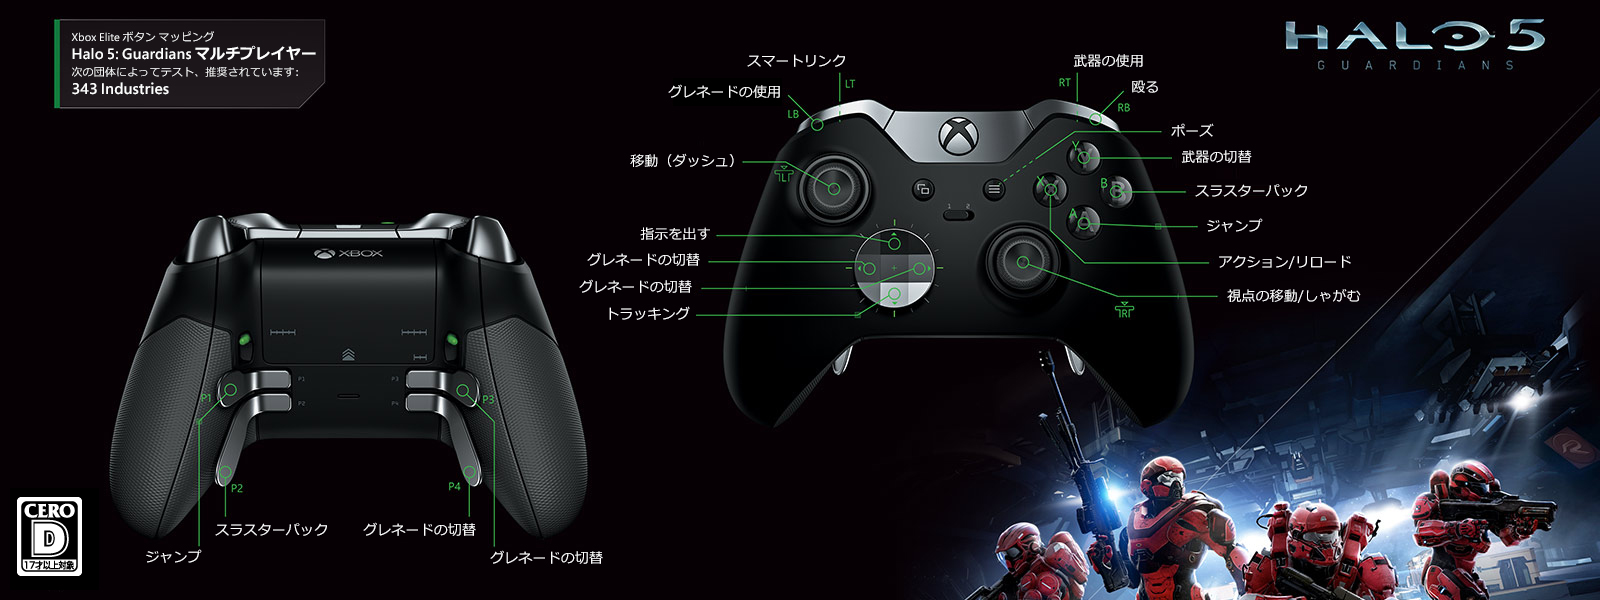 Halo 5 - Guardians マルチプレイヤー Elite マッピング